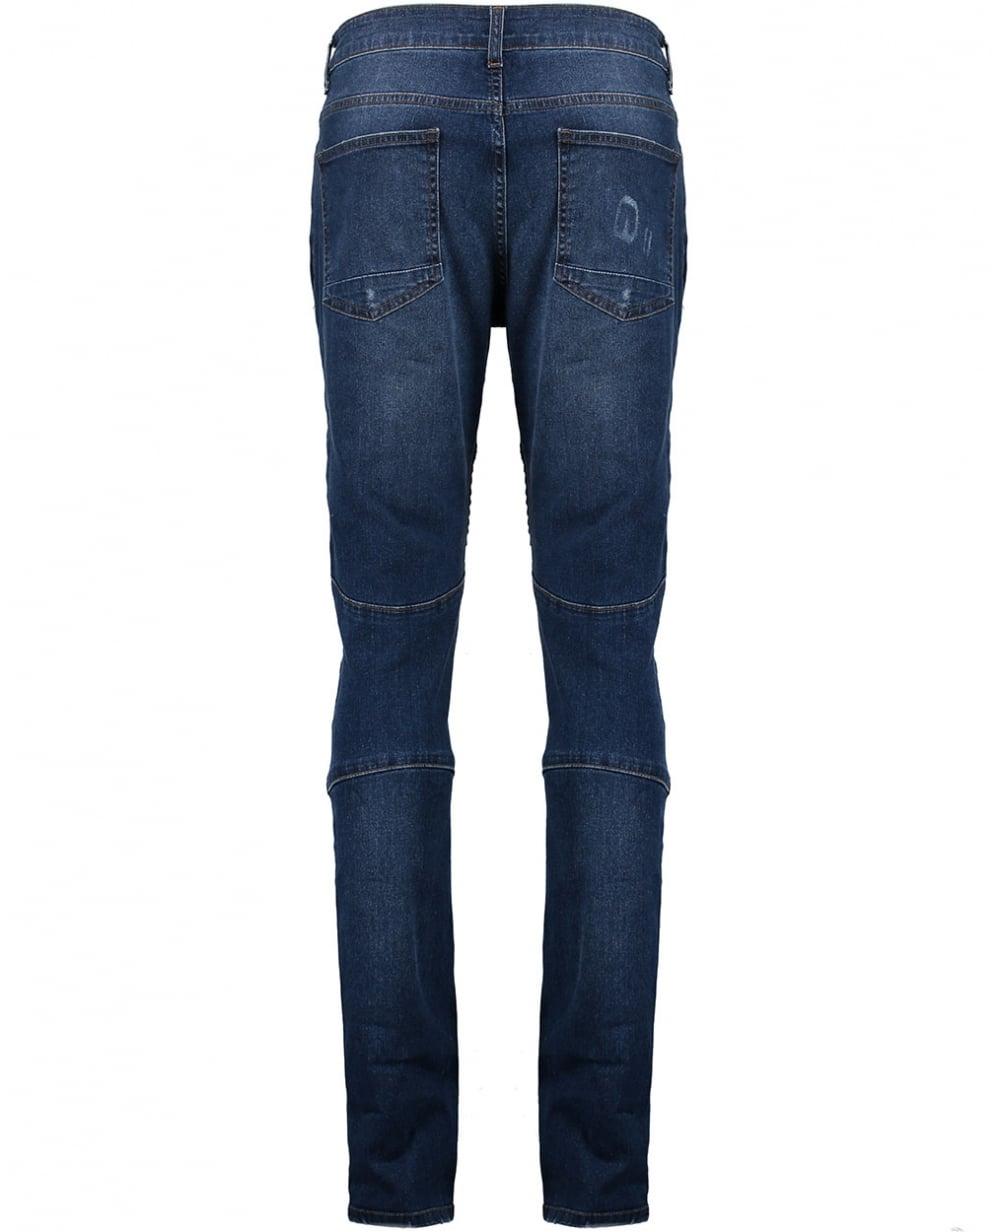 mens denim jeans slim amp straight leg washed ripped